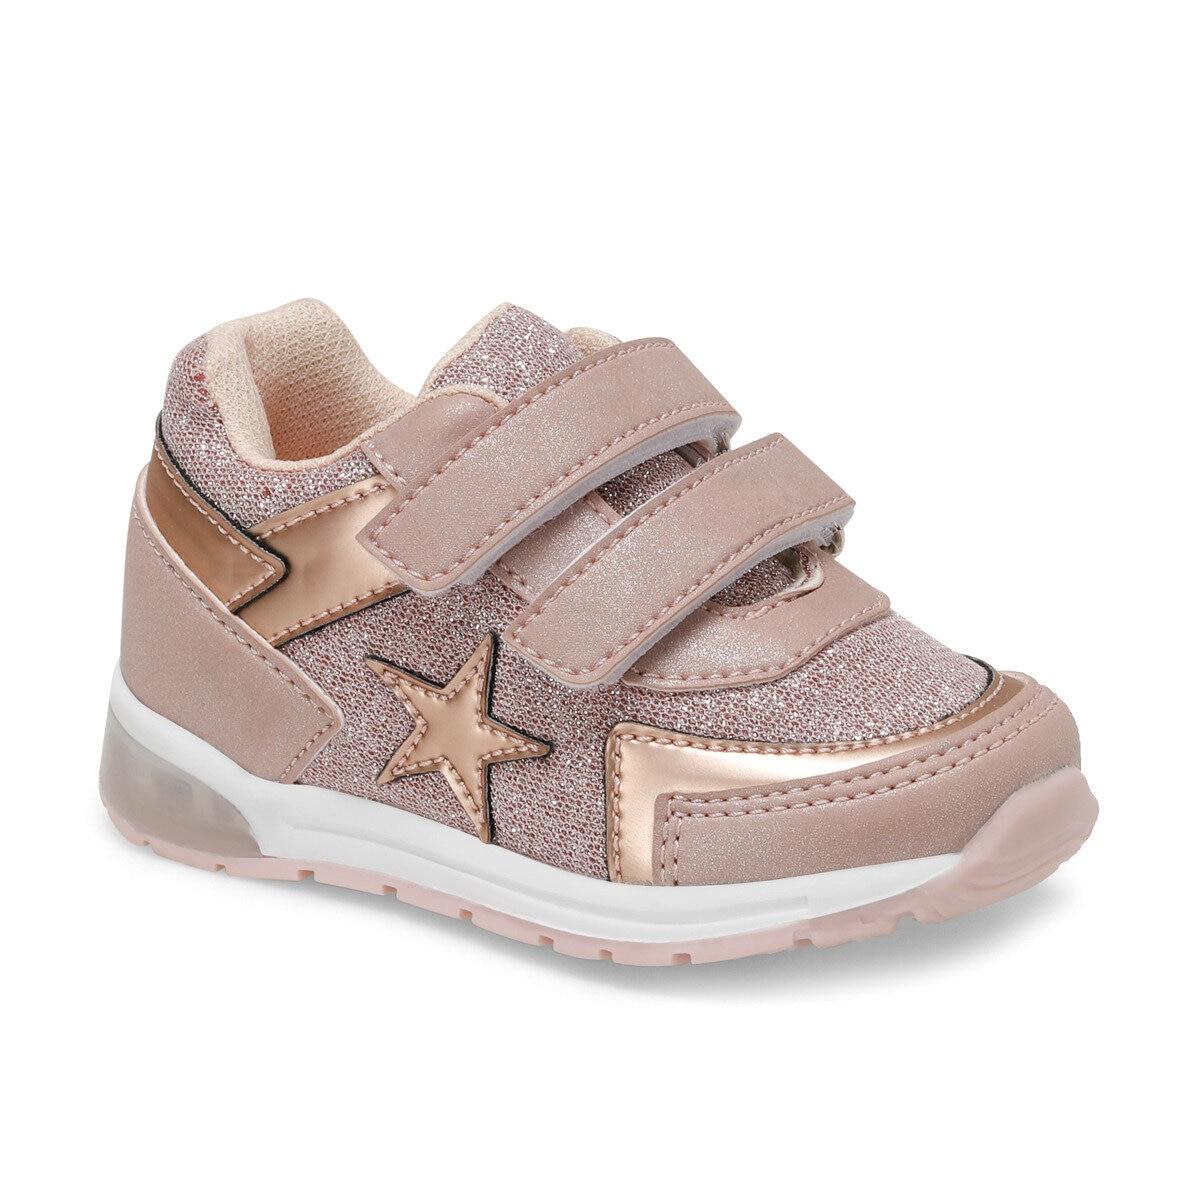 FLO STAR Powder Female Child Sports Shoes Balloon-s